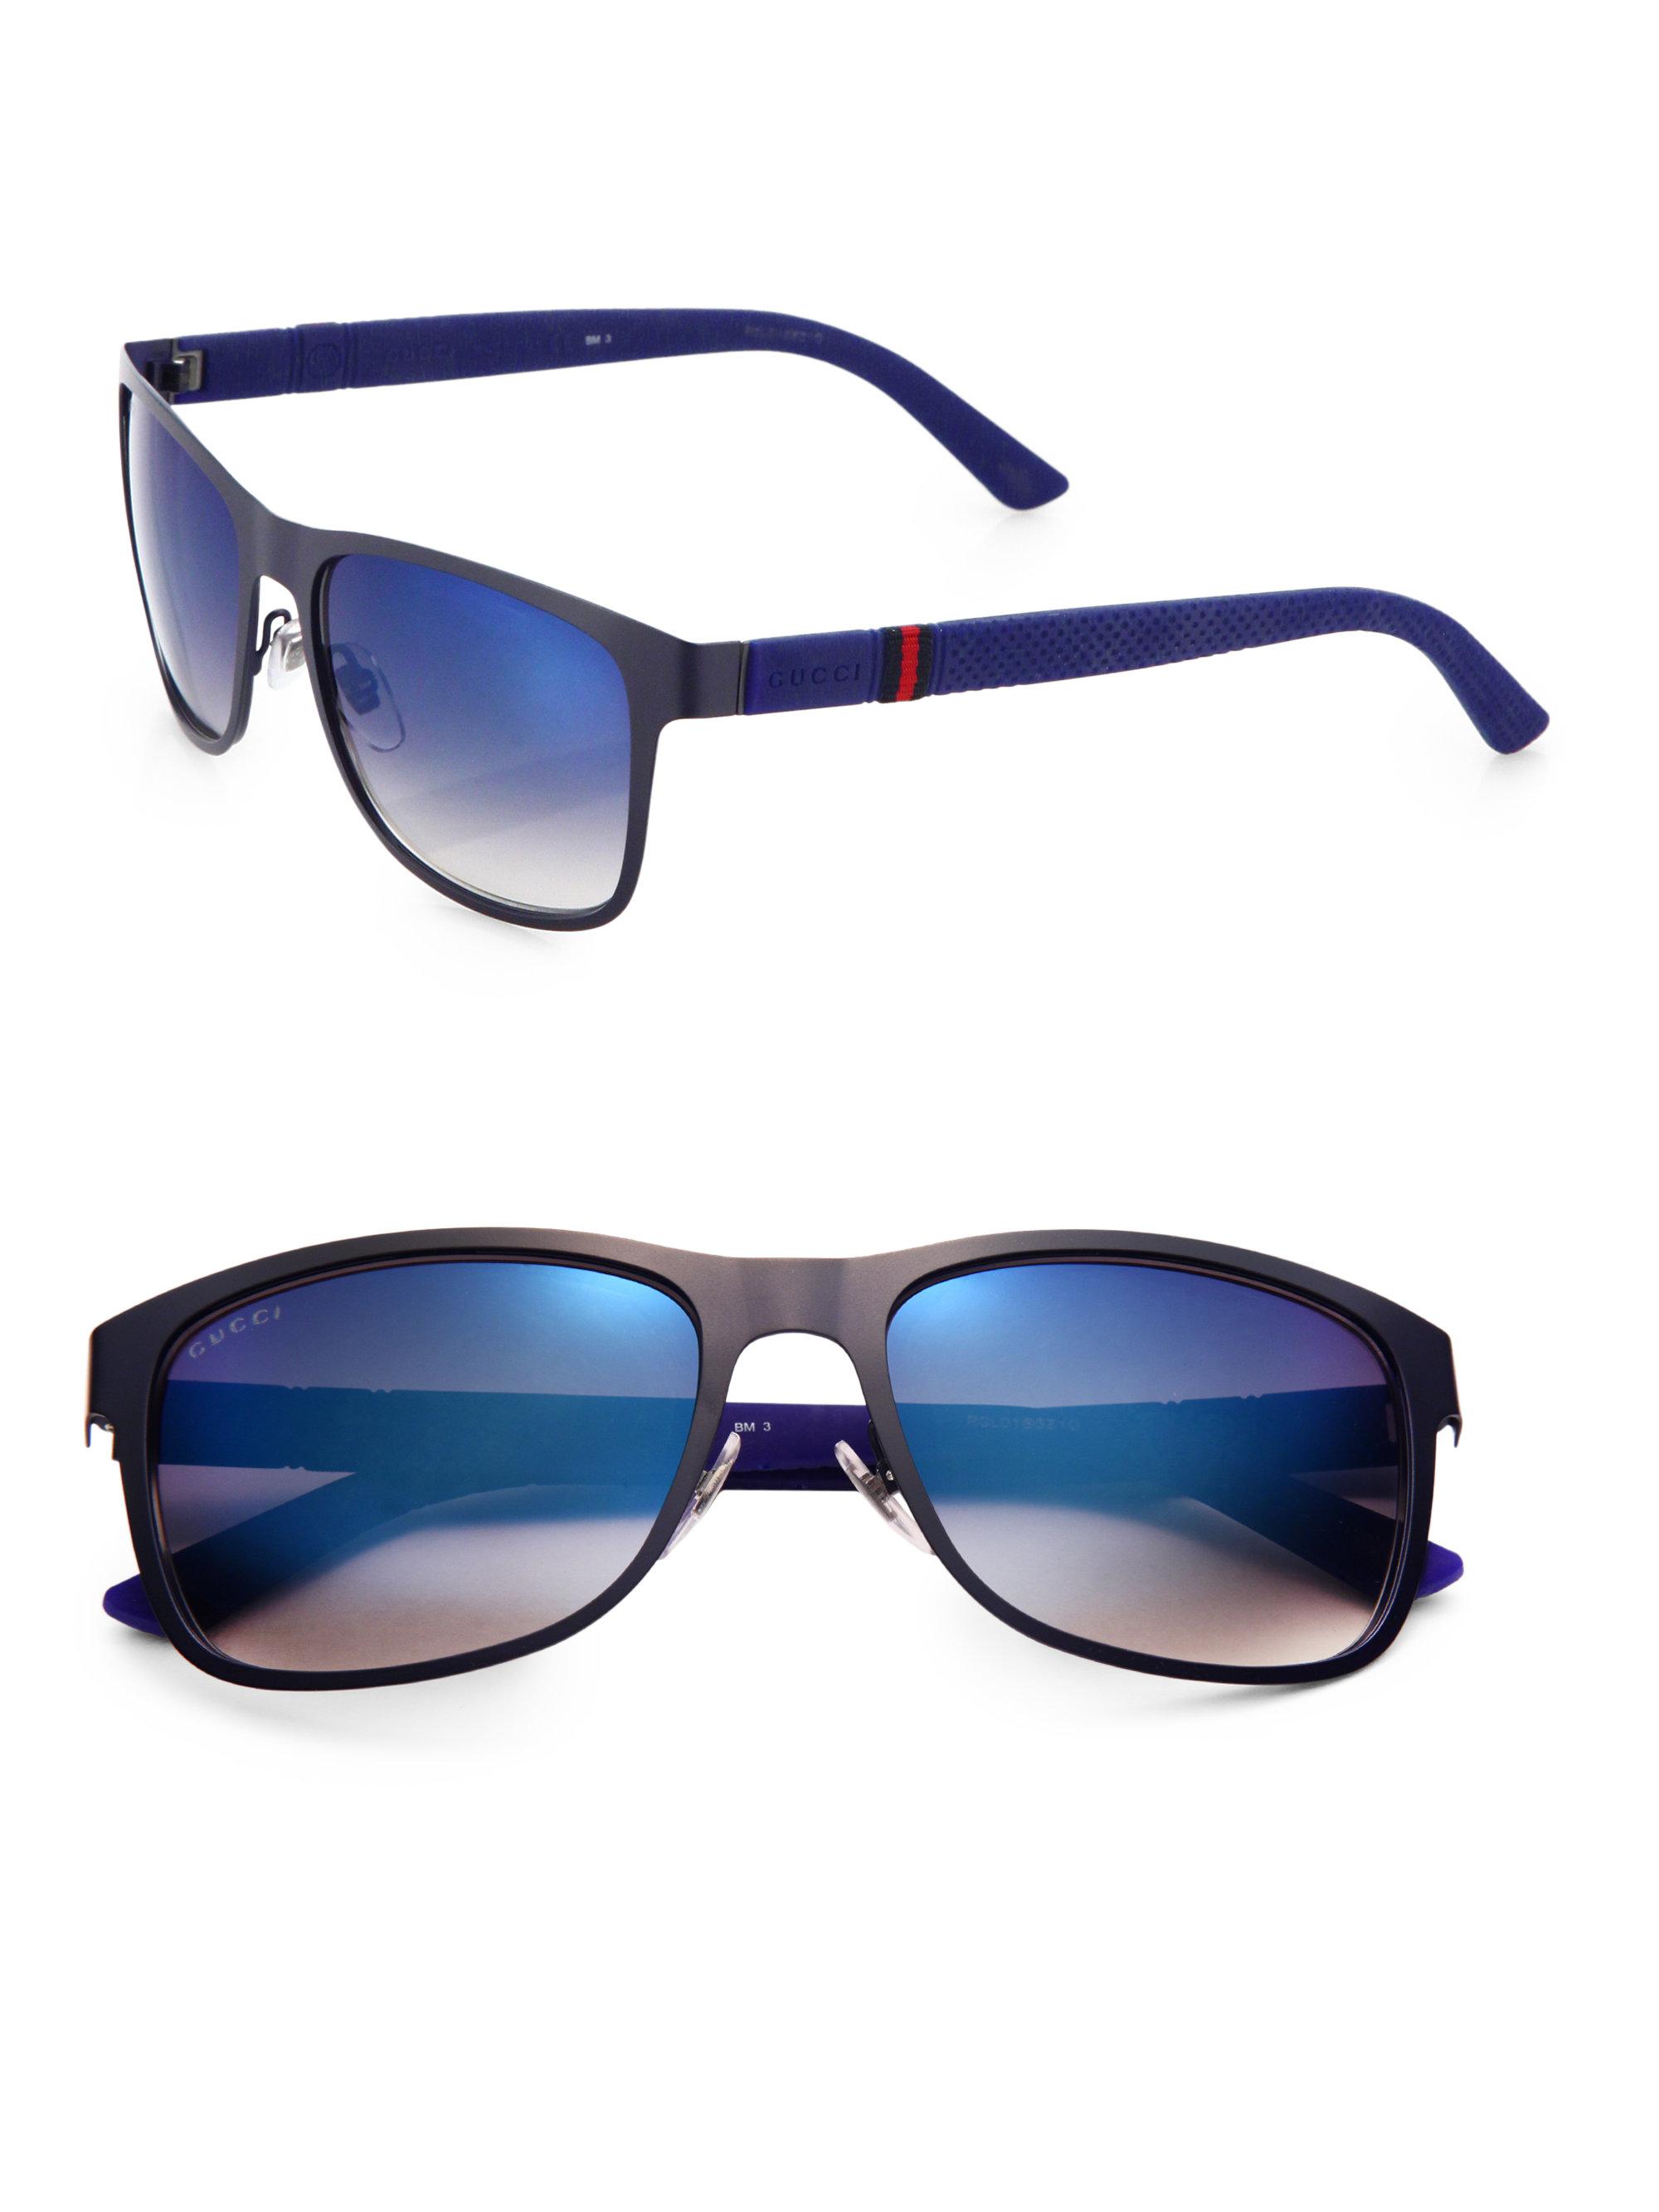 fff86b313b9 Gallery. Previously sold at  Saks Fifth Avenue · Men s Wayfarer Sunglasses